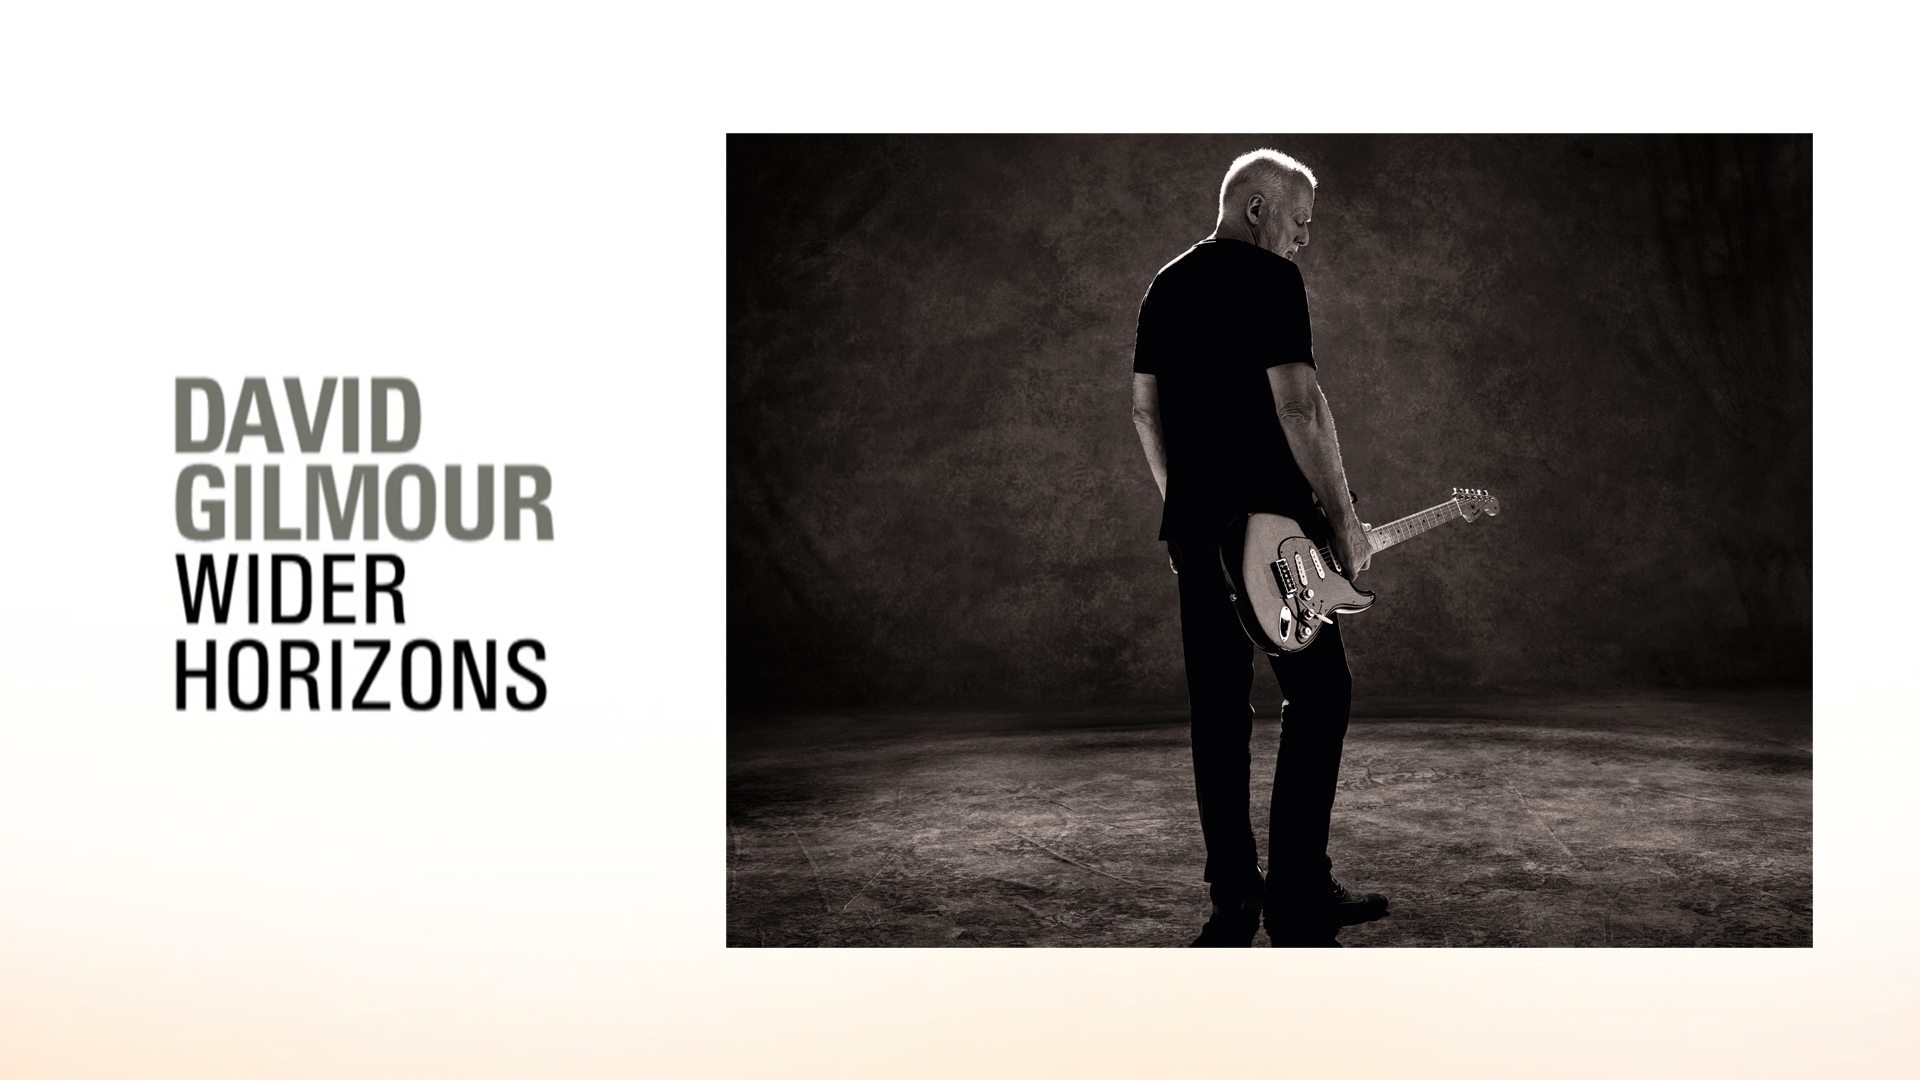 David Gilmour - Wider Horizons